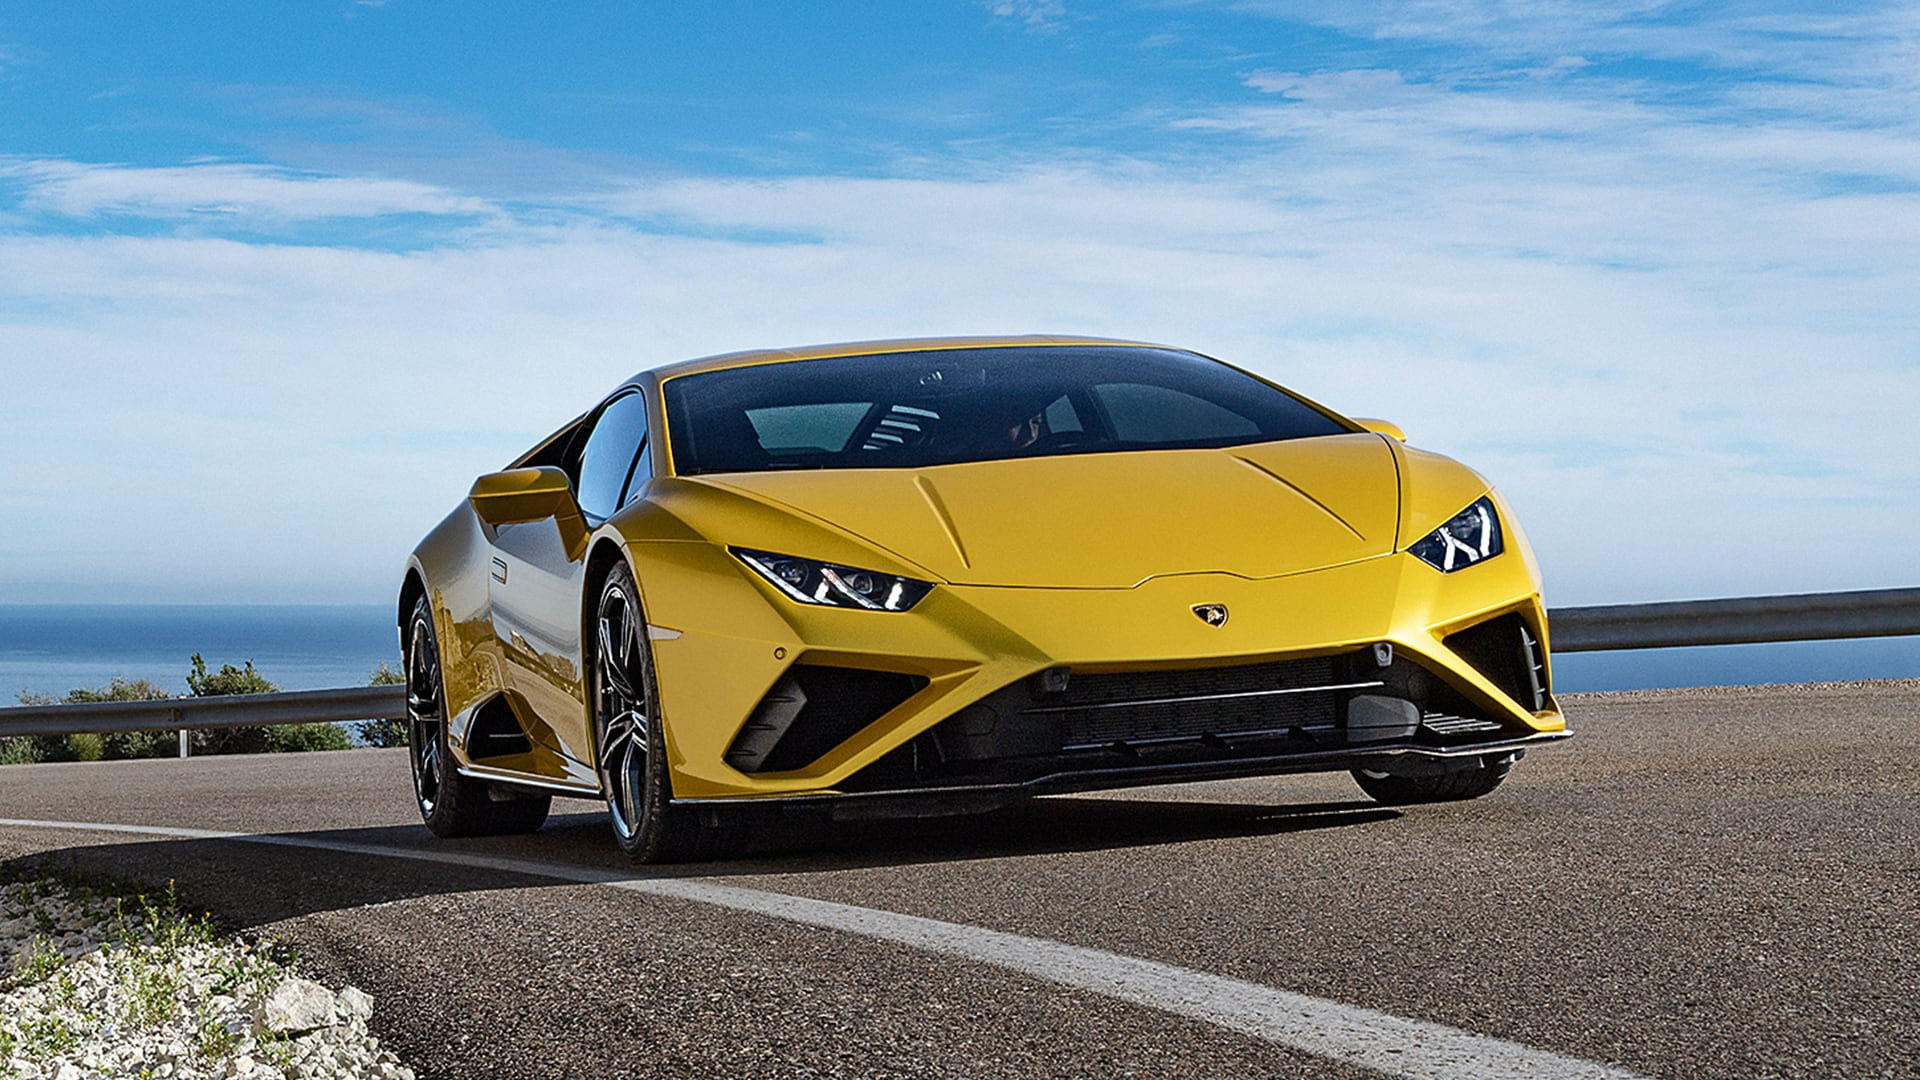 Front view of a Lamborghini Huracan Evo